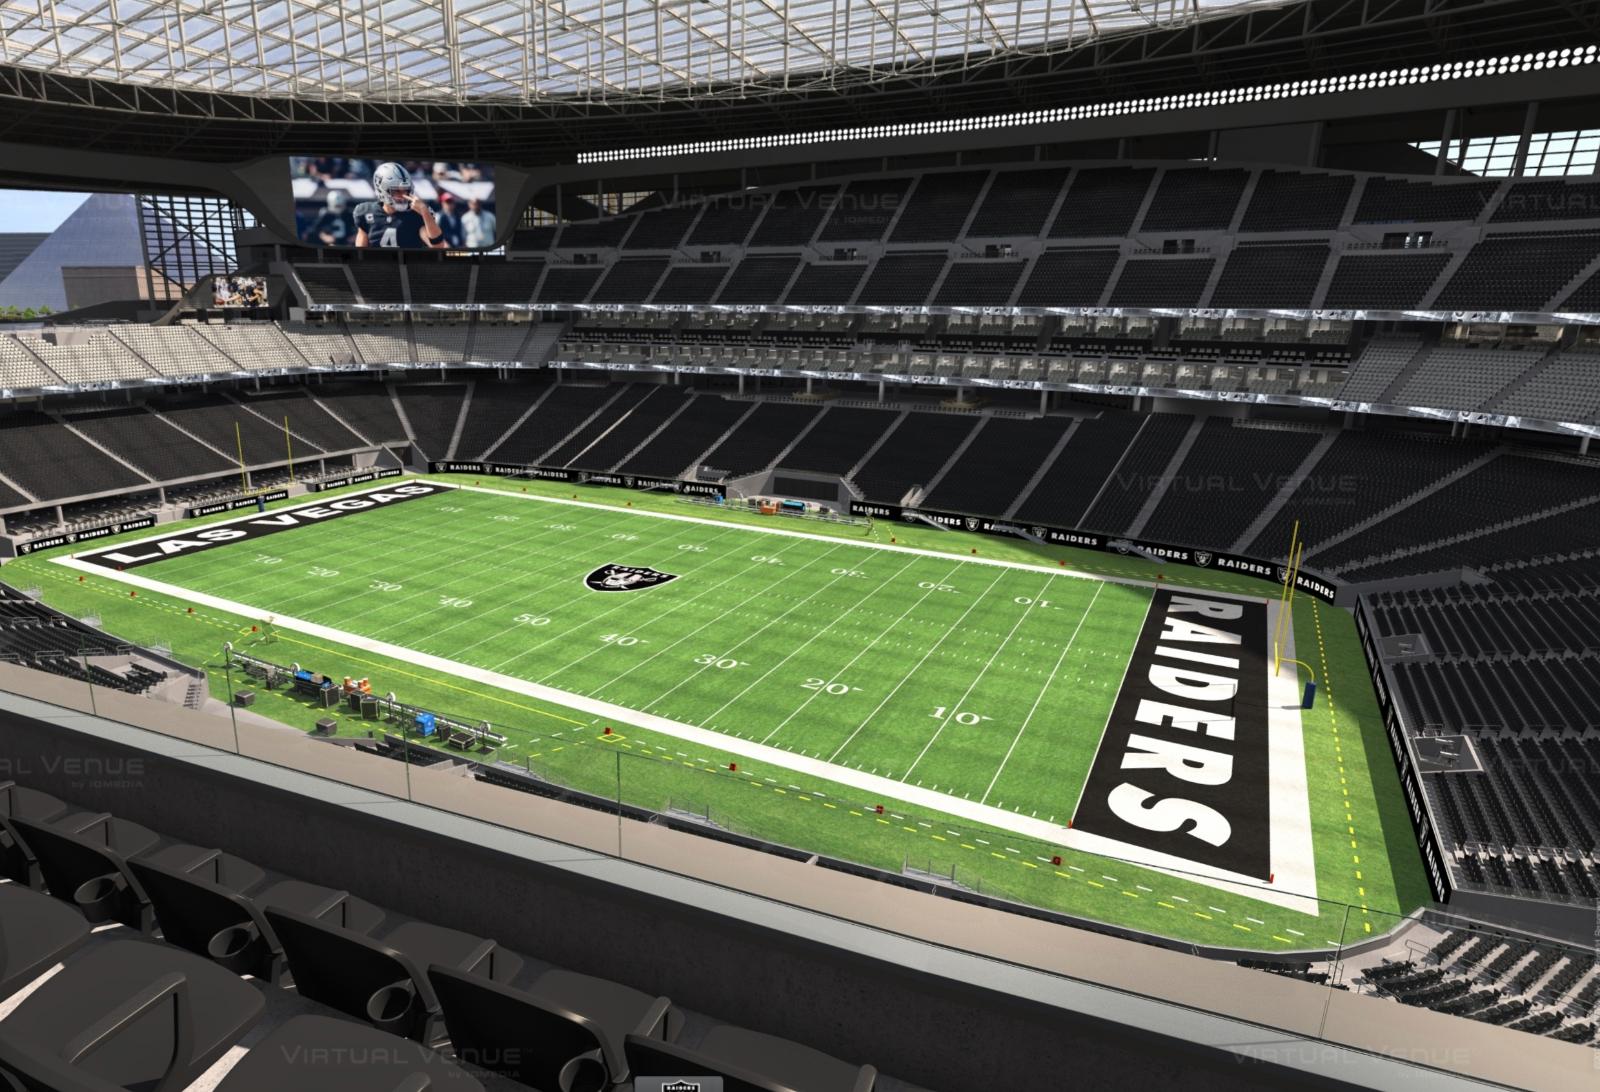 Las Vegas Raiders Vs Chicago Bears 2 Tickets - Section 334 Row 2 Seats 9-10 - $600.00